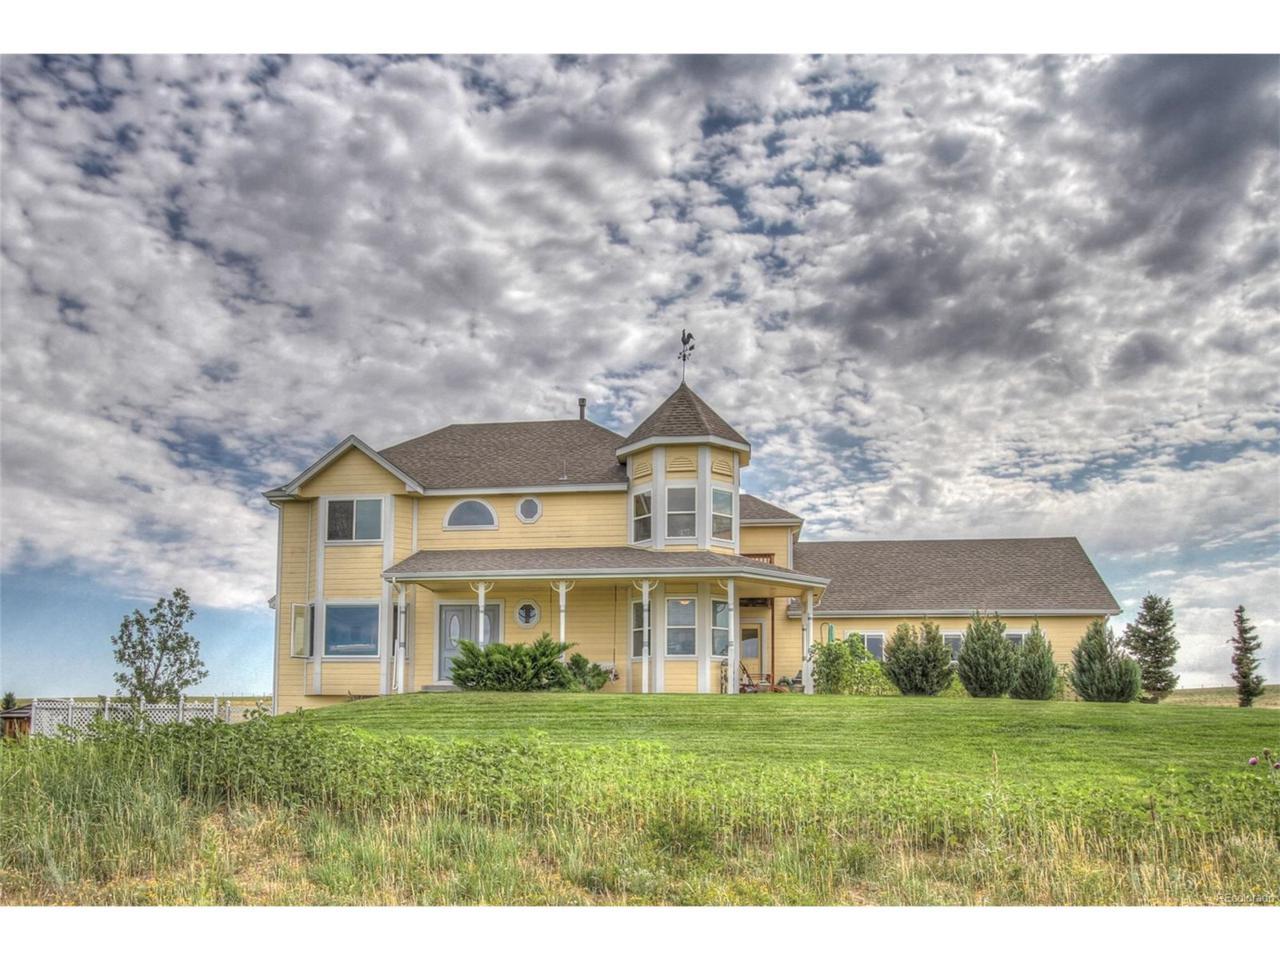 41230 Valley View Court, Elizabeth, CO 80107 (MLS #4115632) :: 8z Real Estate